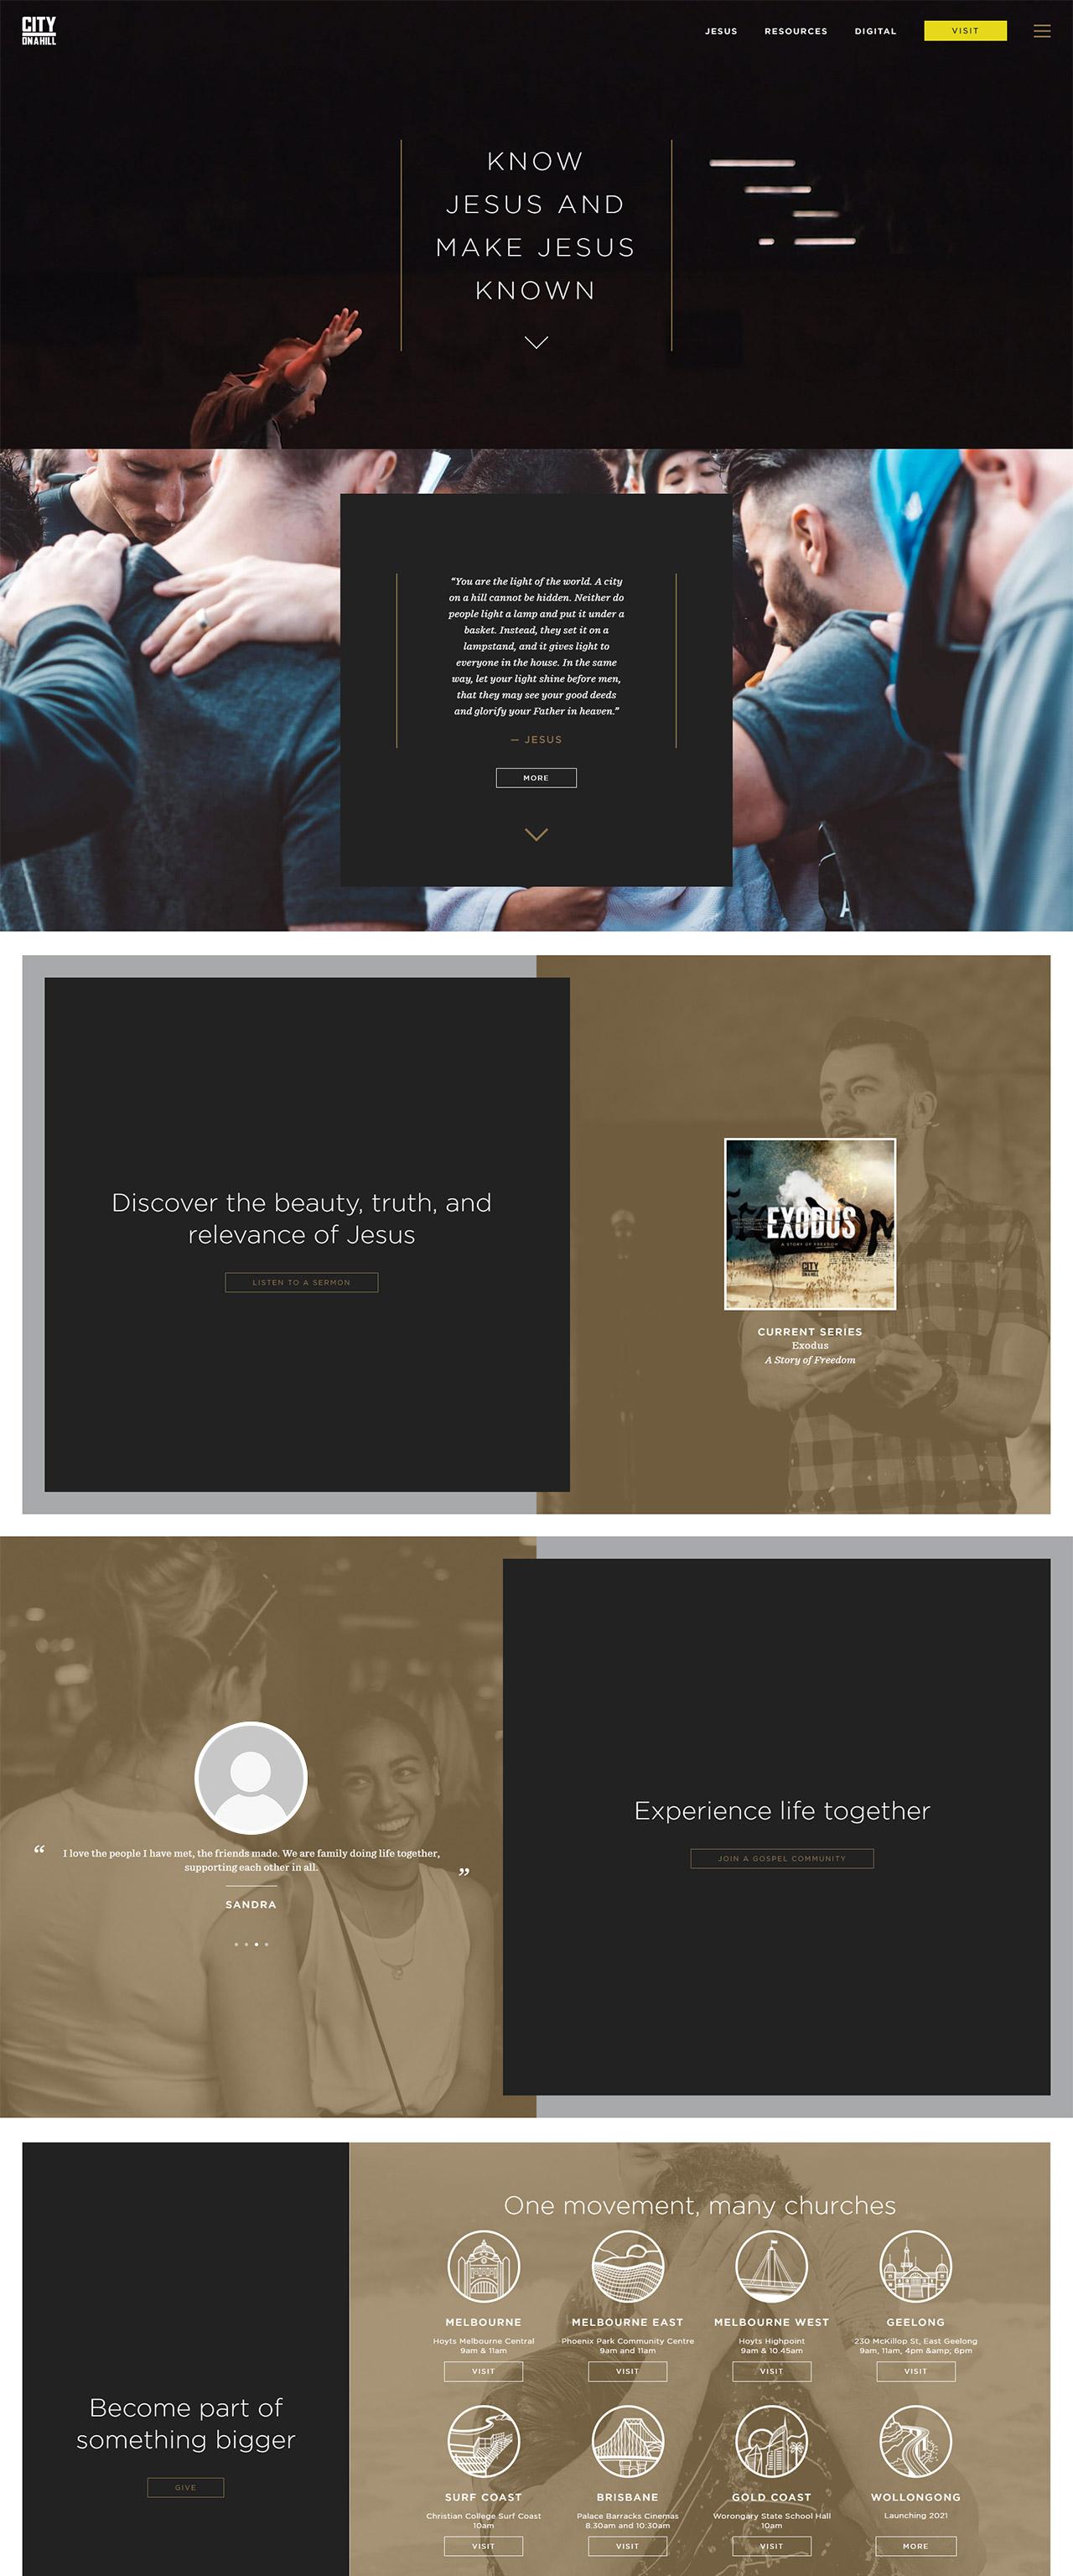 City on a Hill Website Design | Voltekka: Website Design & Digital Marketing Specialists